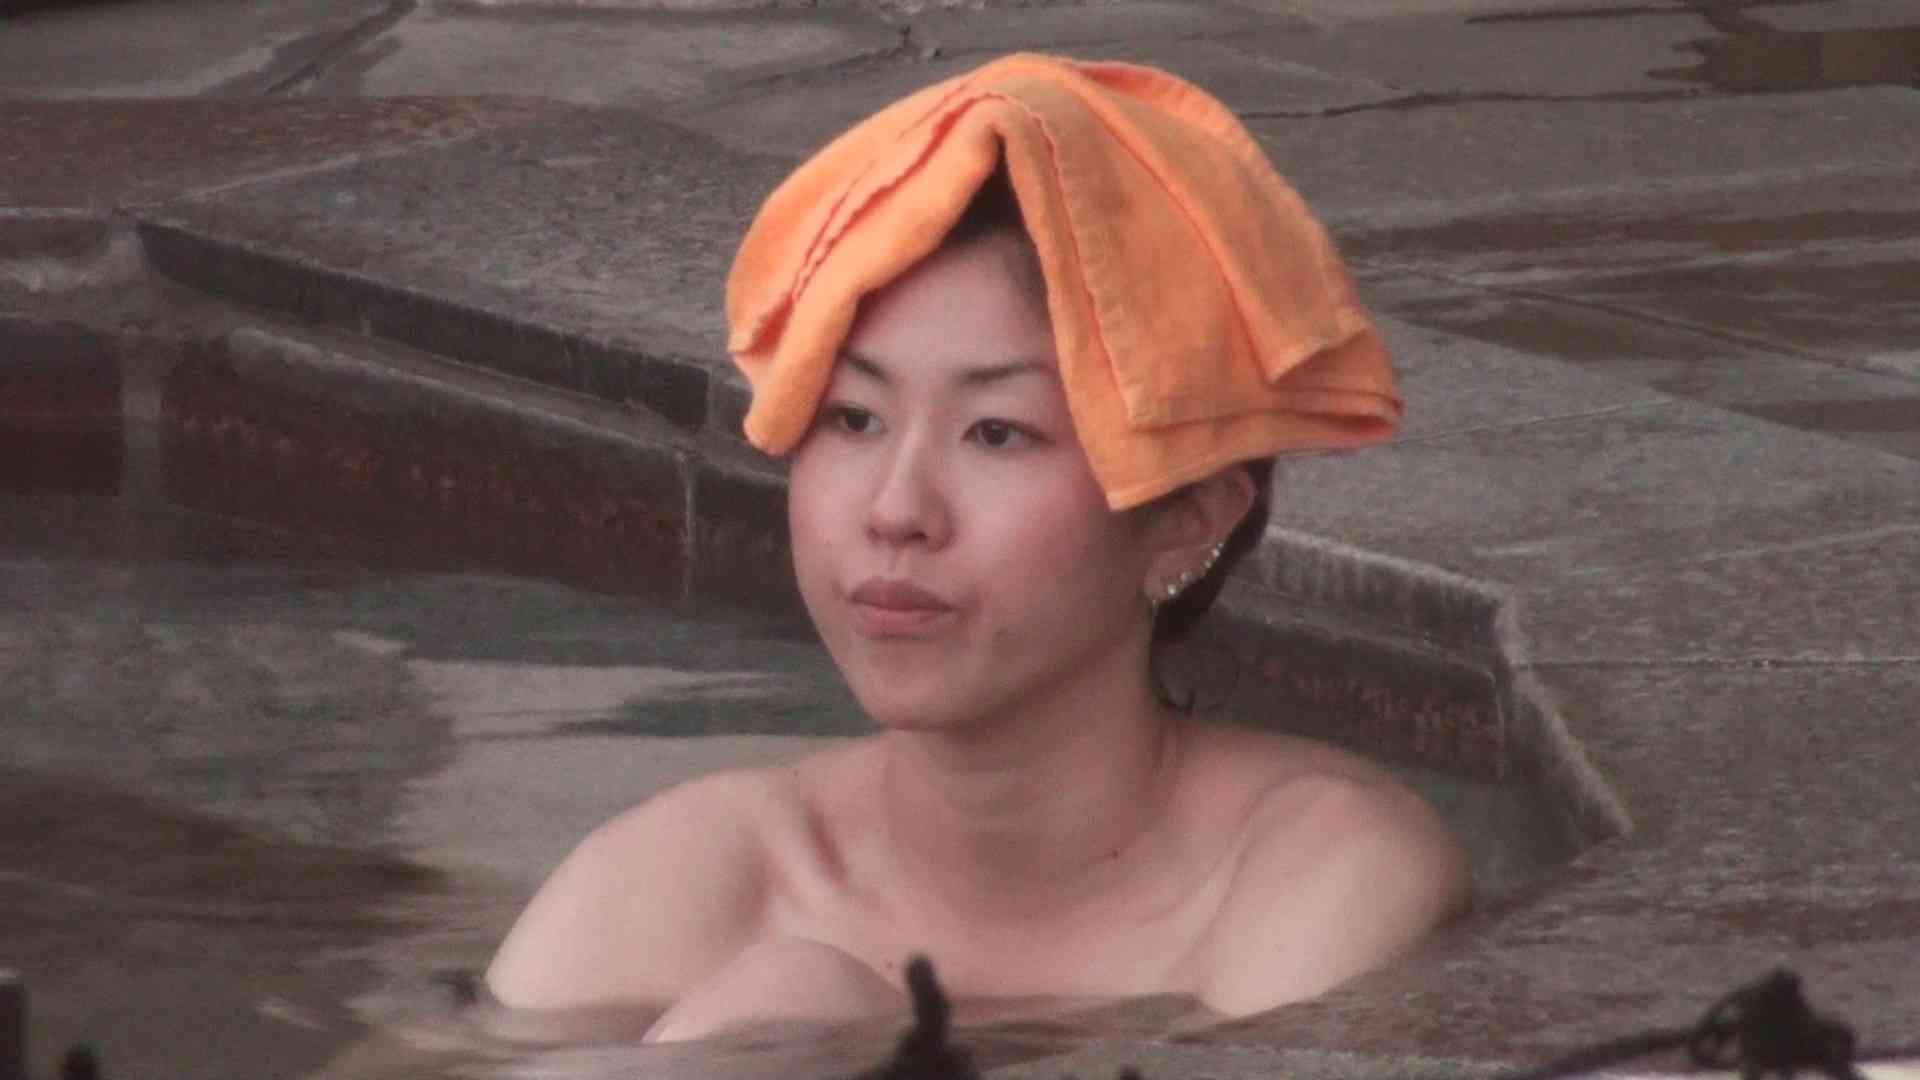 Aquaな露天風呂Vol.135 盗撮師作品  105pic 99